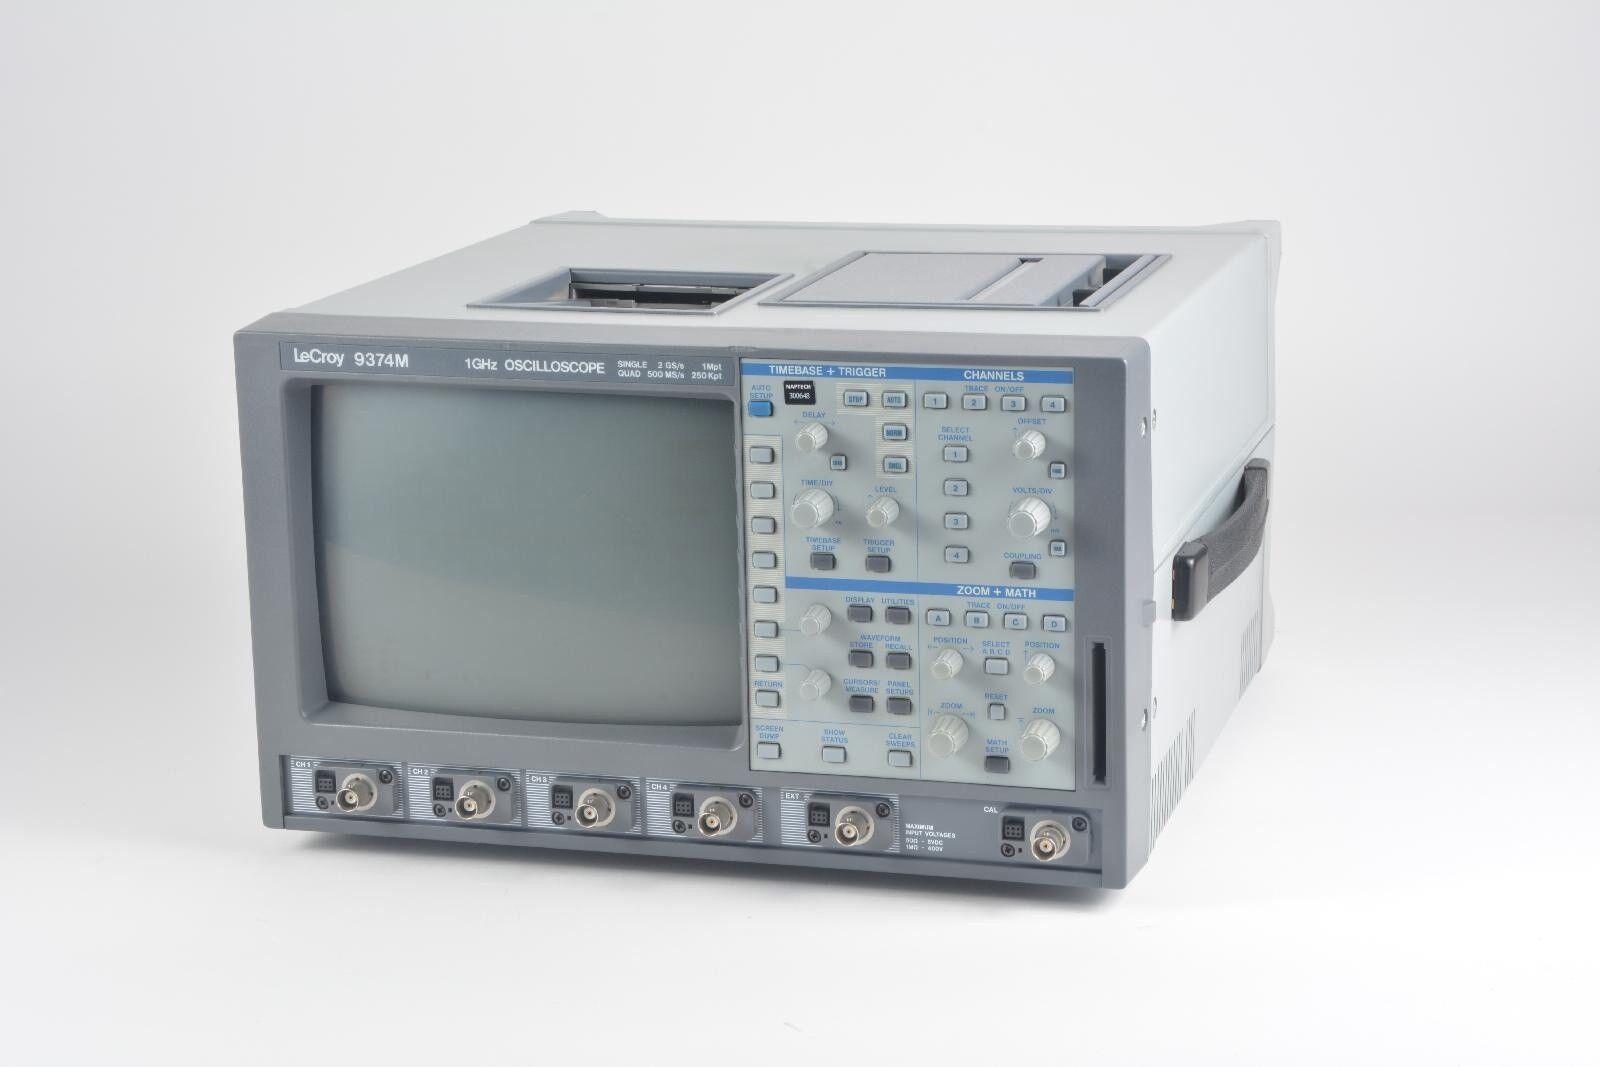 lecroy 9374m digital storage oscilloscope 1ghz ebay rh ebay com eBay Auction Buy It Now eBay Auction Buy It Now